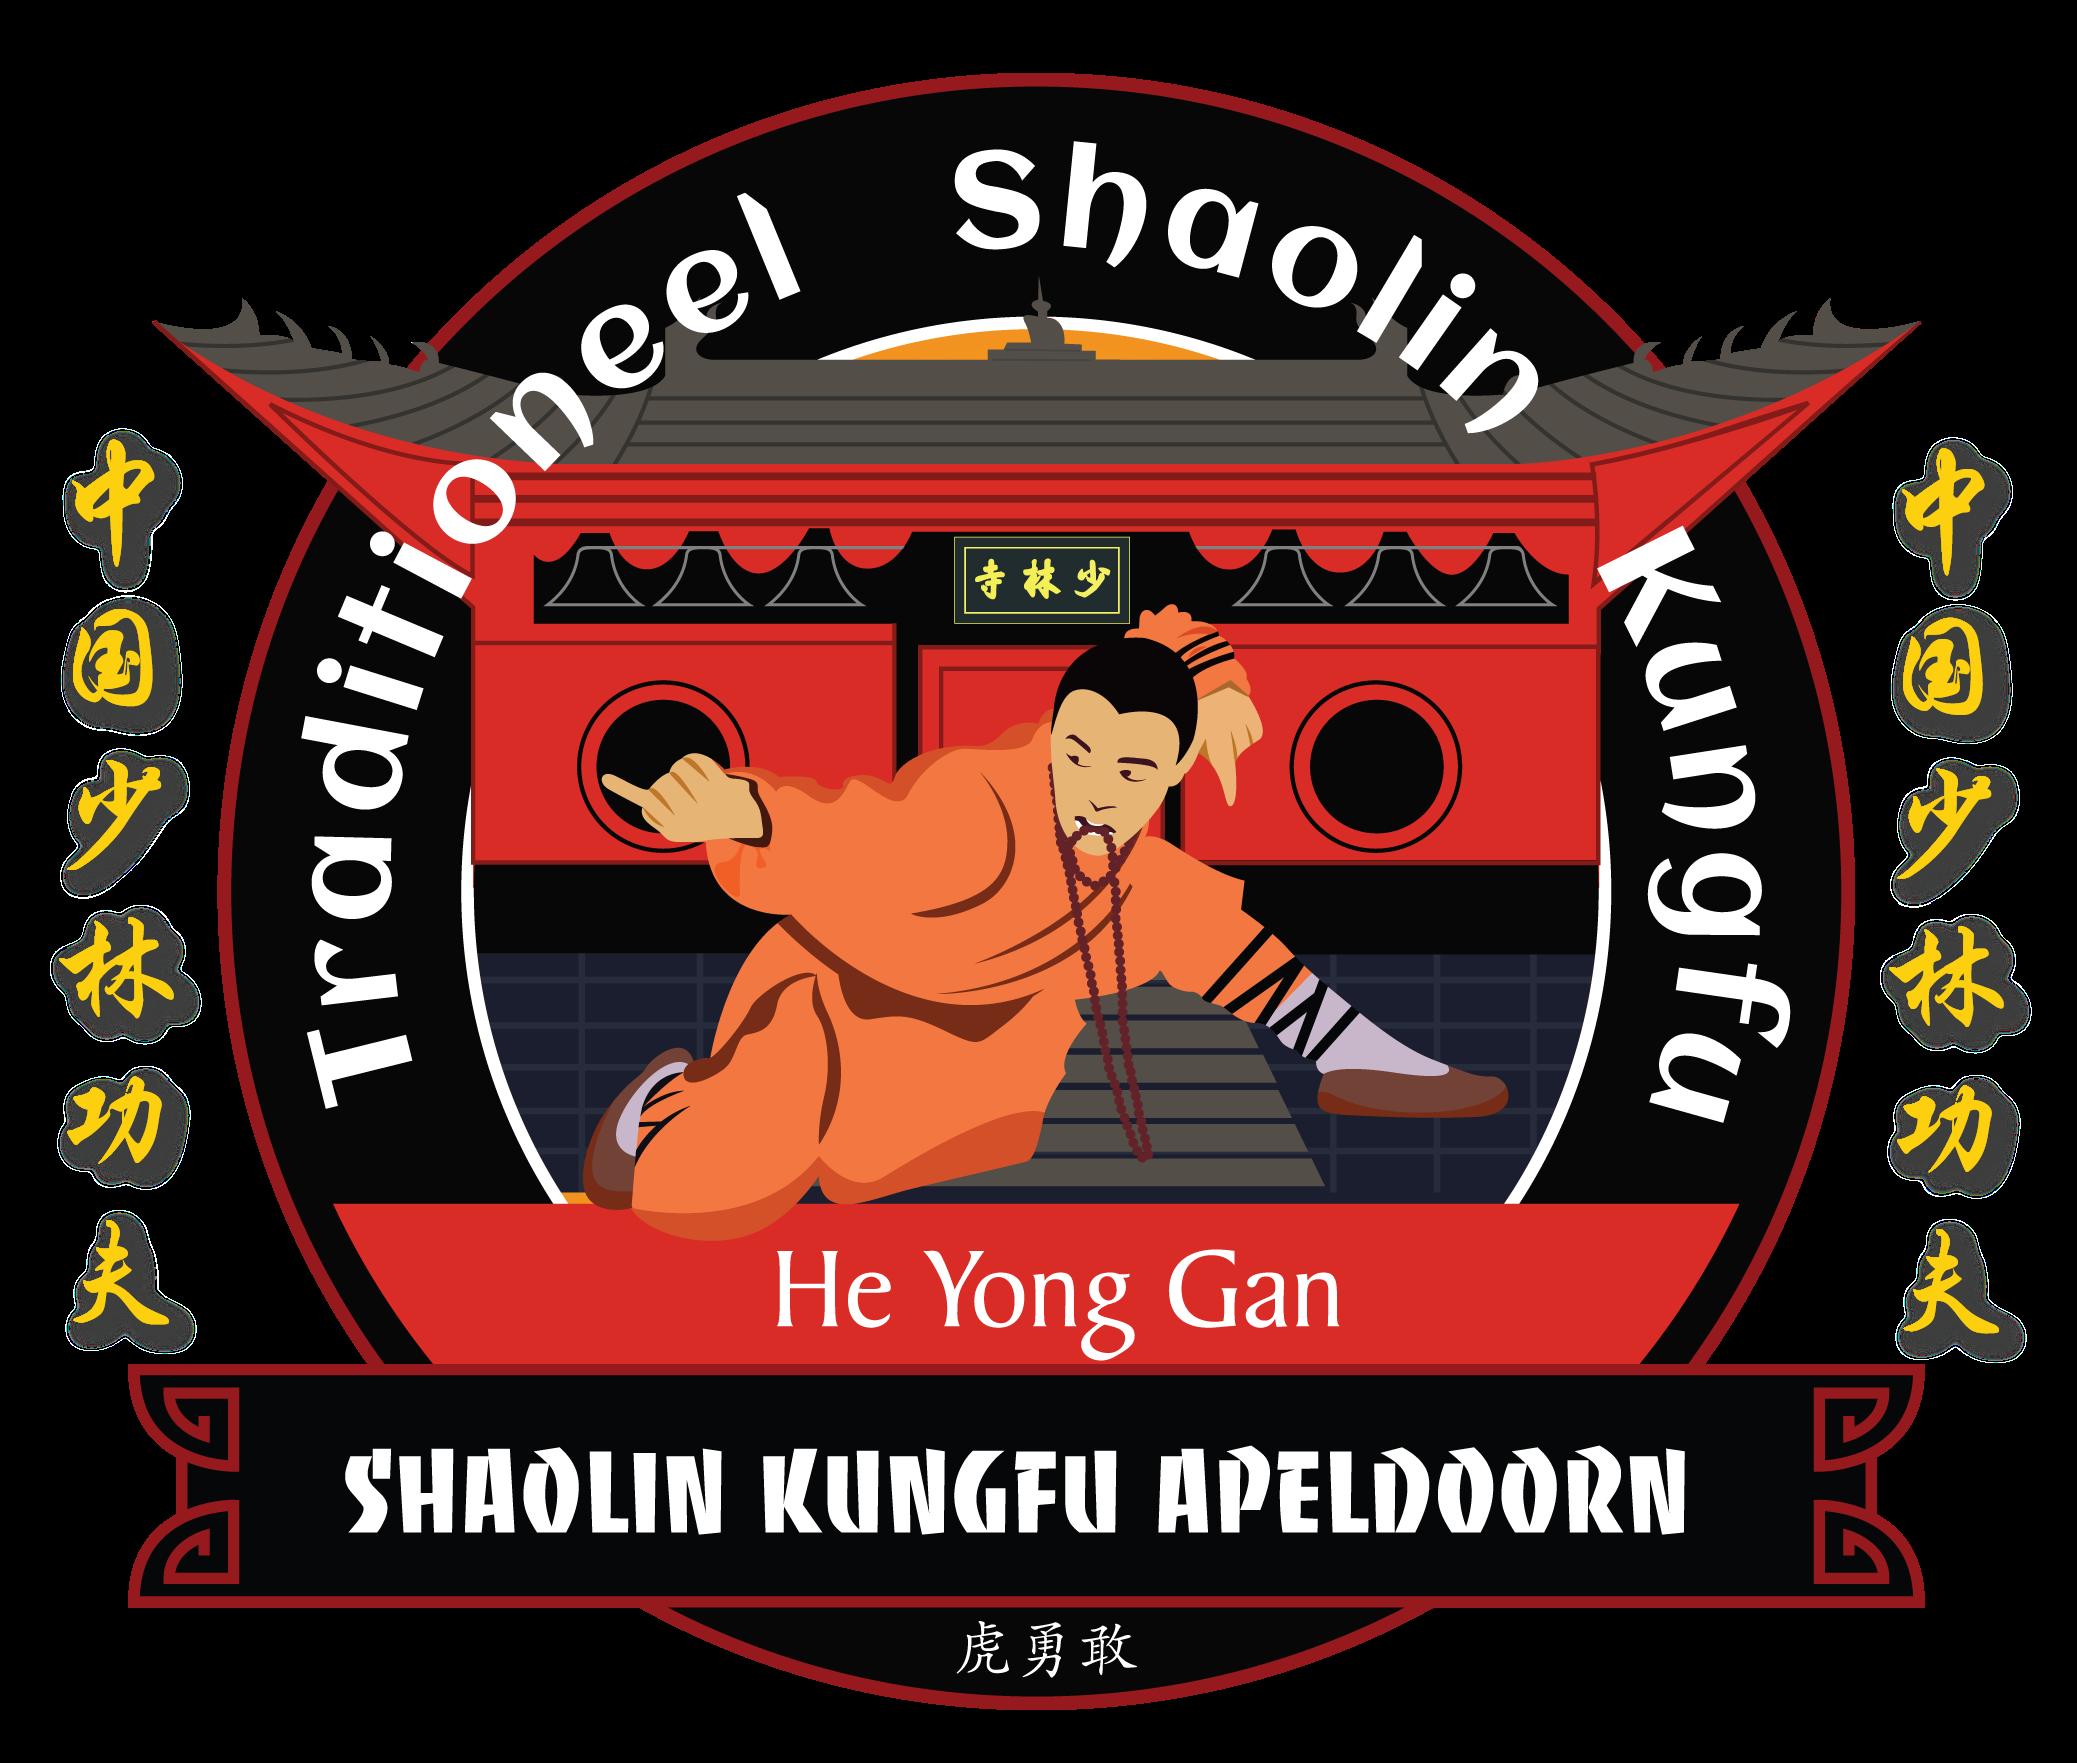 Shaolin - He Yong Gan Apeldoorn